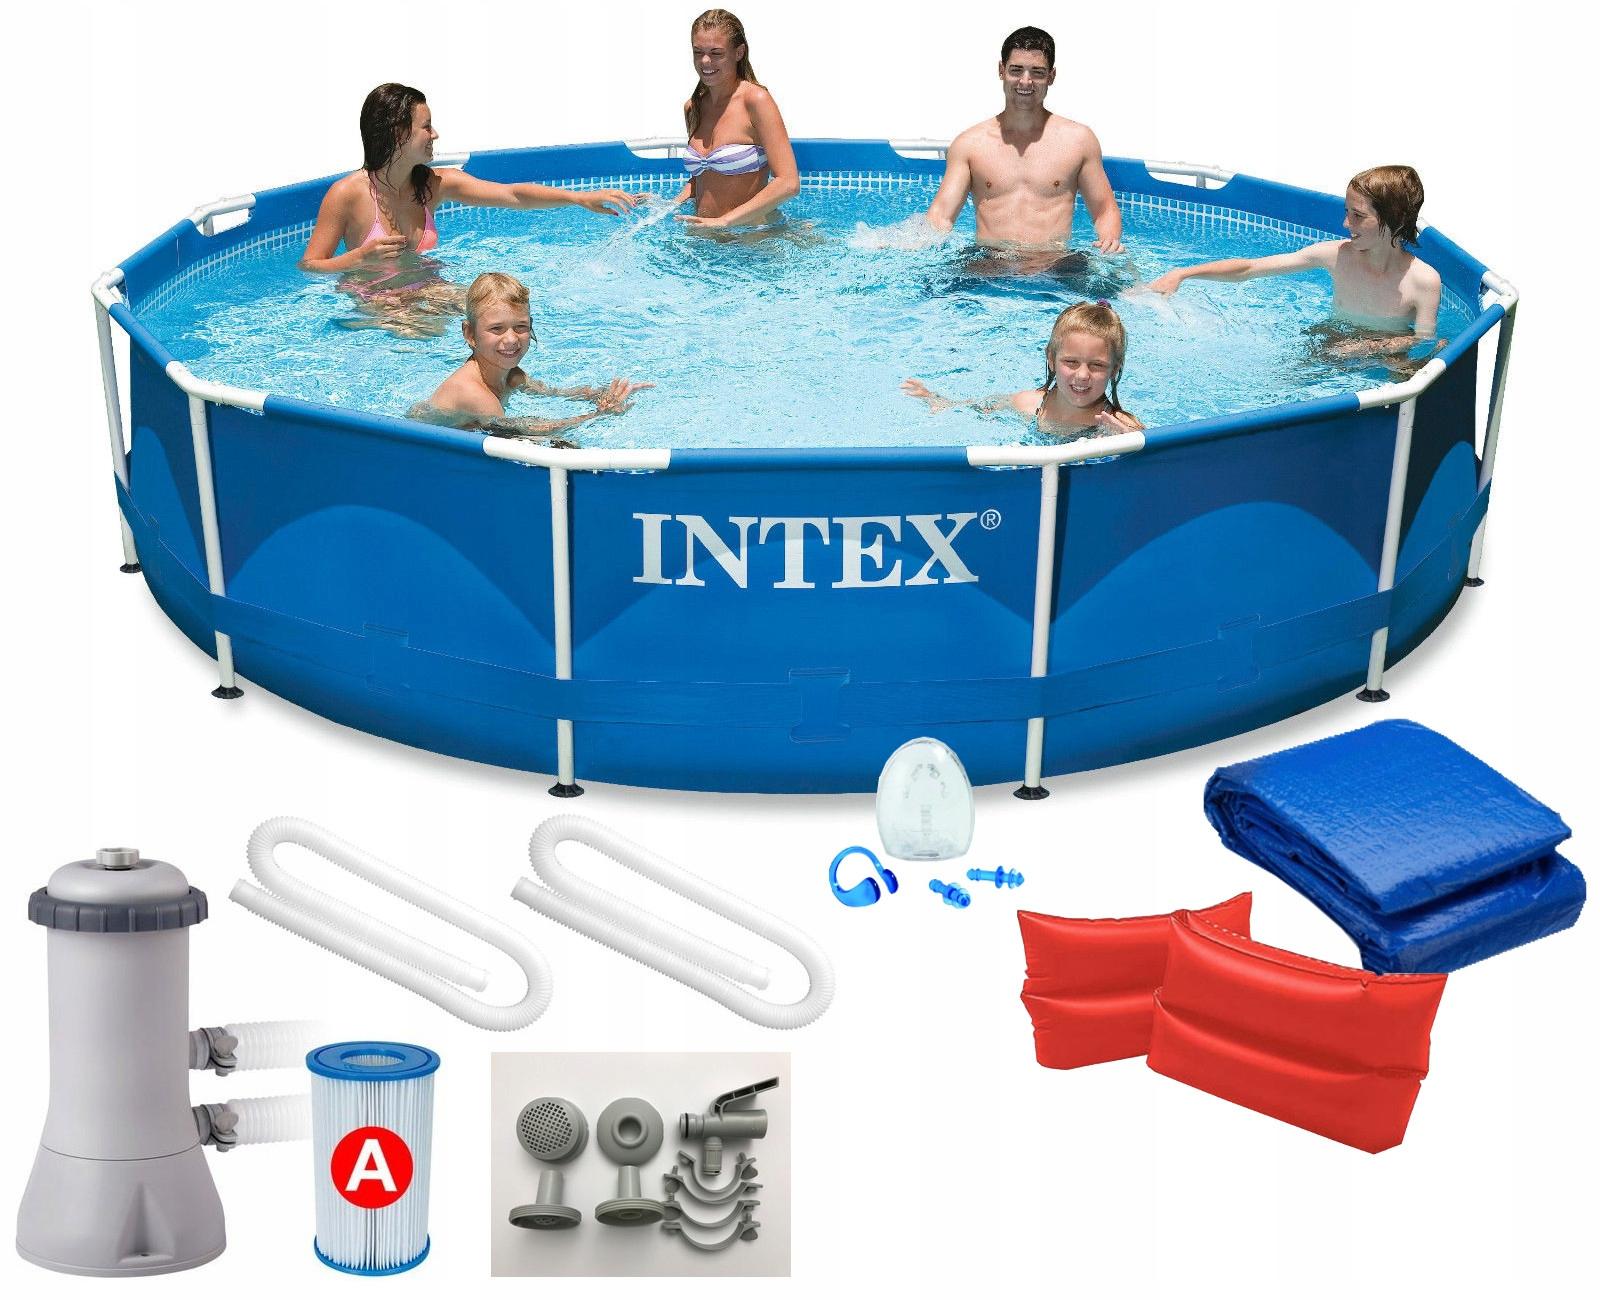 INTEX 28212 9w1 366x76cm BASEN STELAŻOWY POMPA